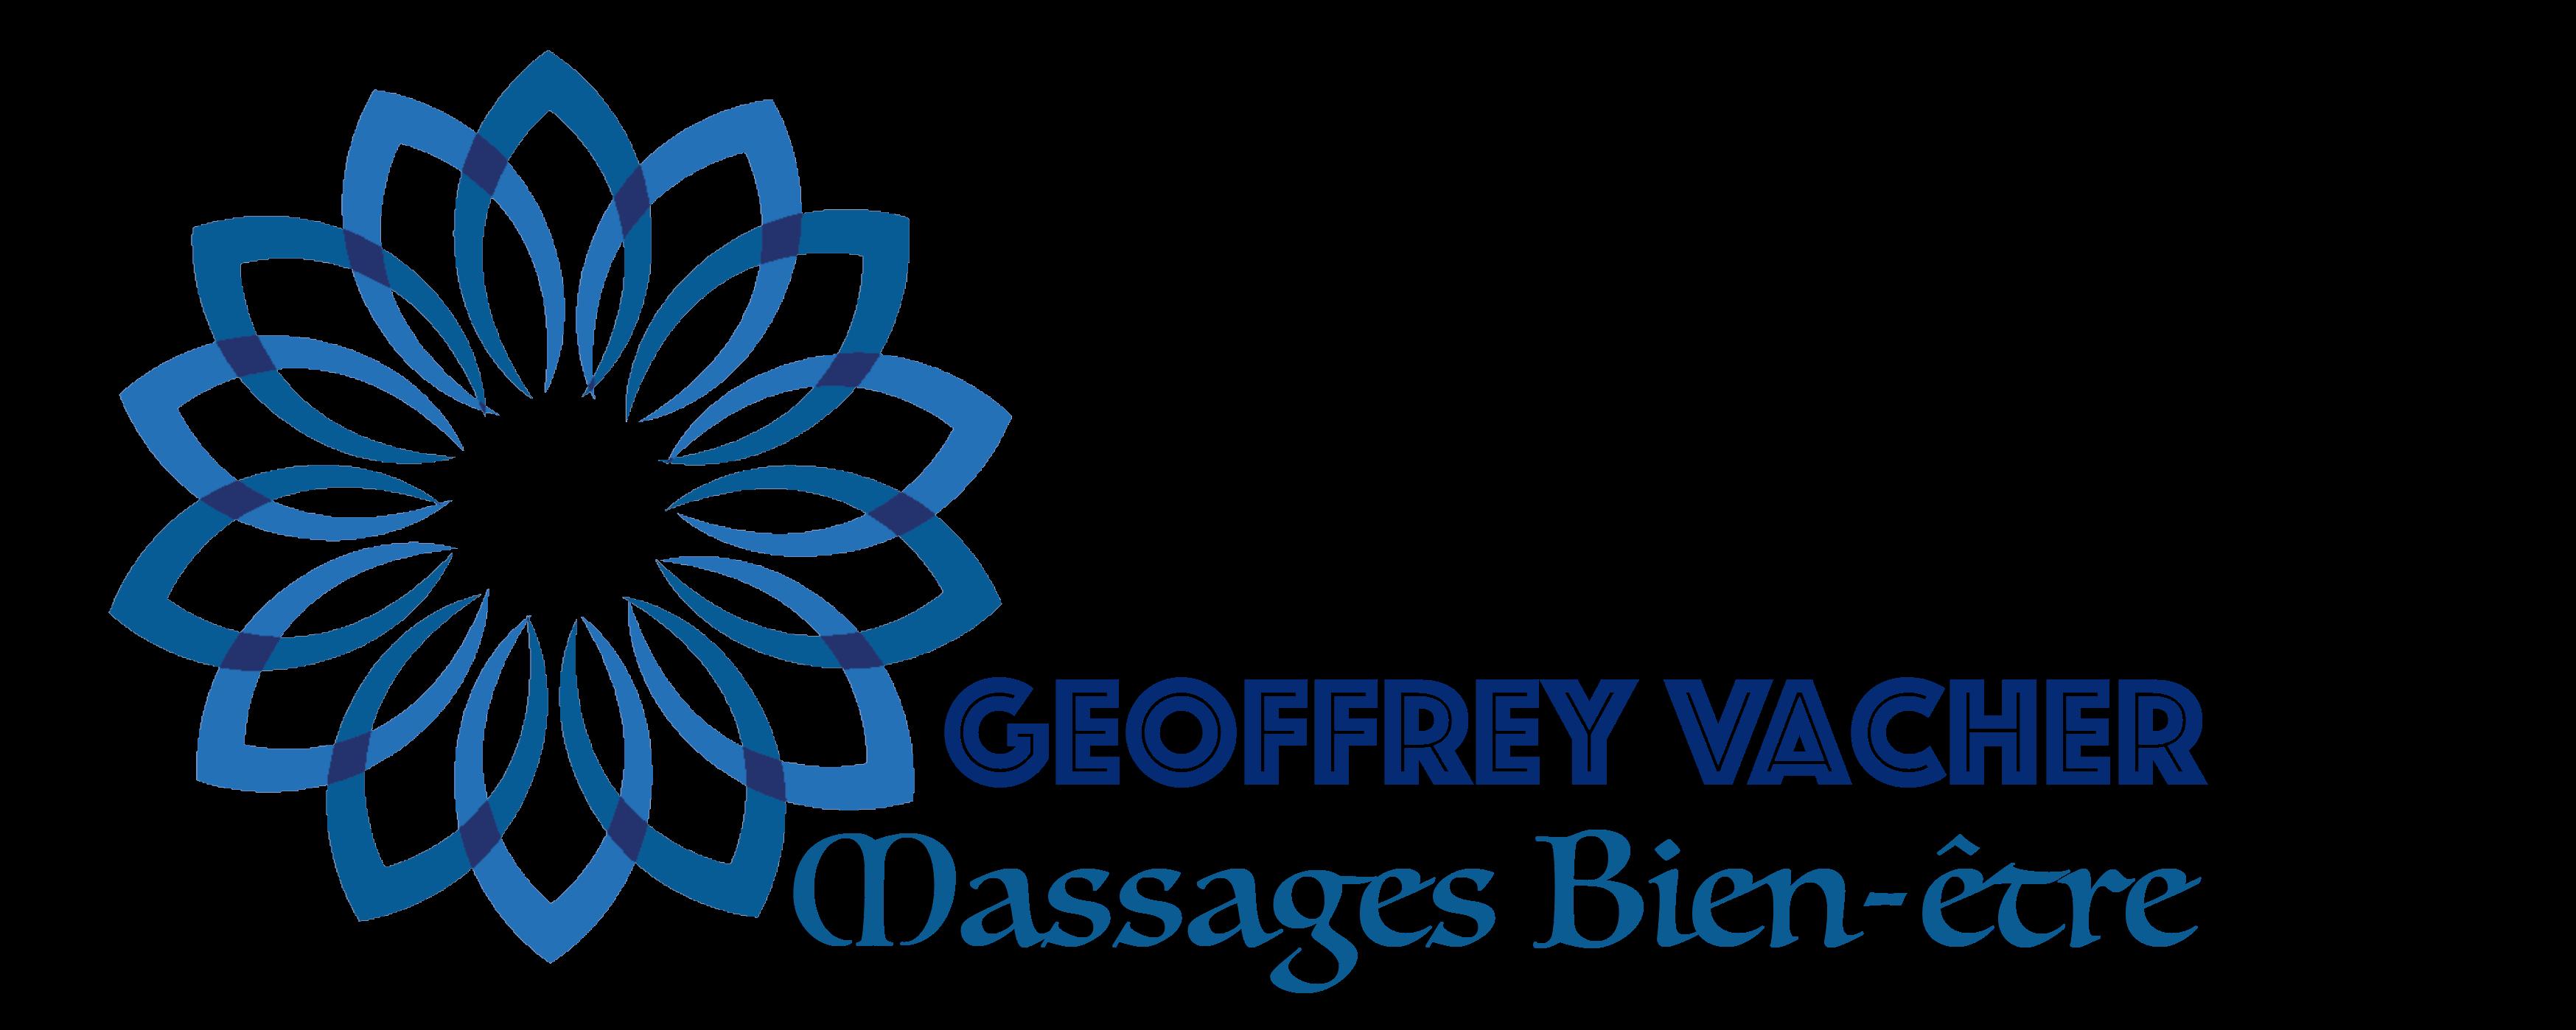 Geoffrey Vacher – Praticien en massage de bien être